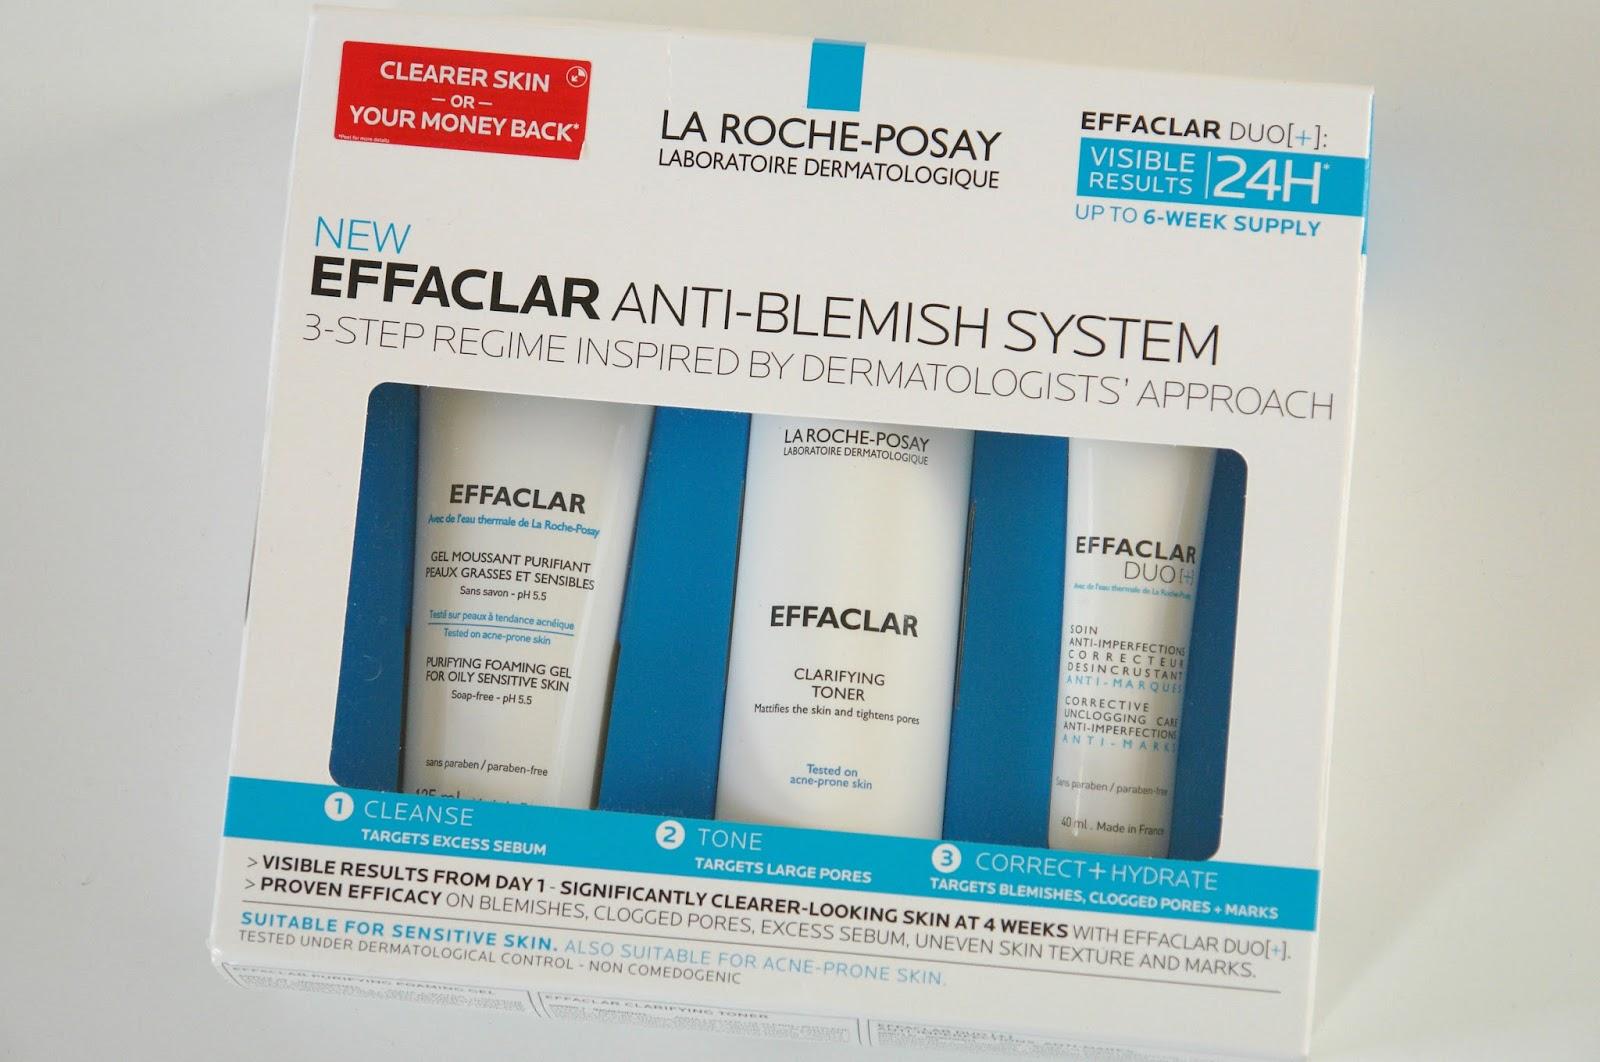 La Roche-Posay Effaclar Anti-Blemish System review, beauty, review, skincare, blogger, La Roche-Posay Effaclar Purifying Gel Cleanser, La Roche-Posay Effaclar Clarifying Toner,  La Roche-Posay Effaclar Duo [+] Anti-Blemish Cream